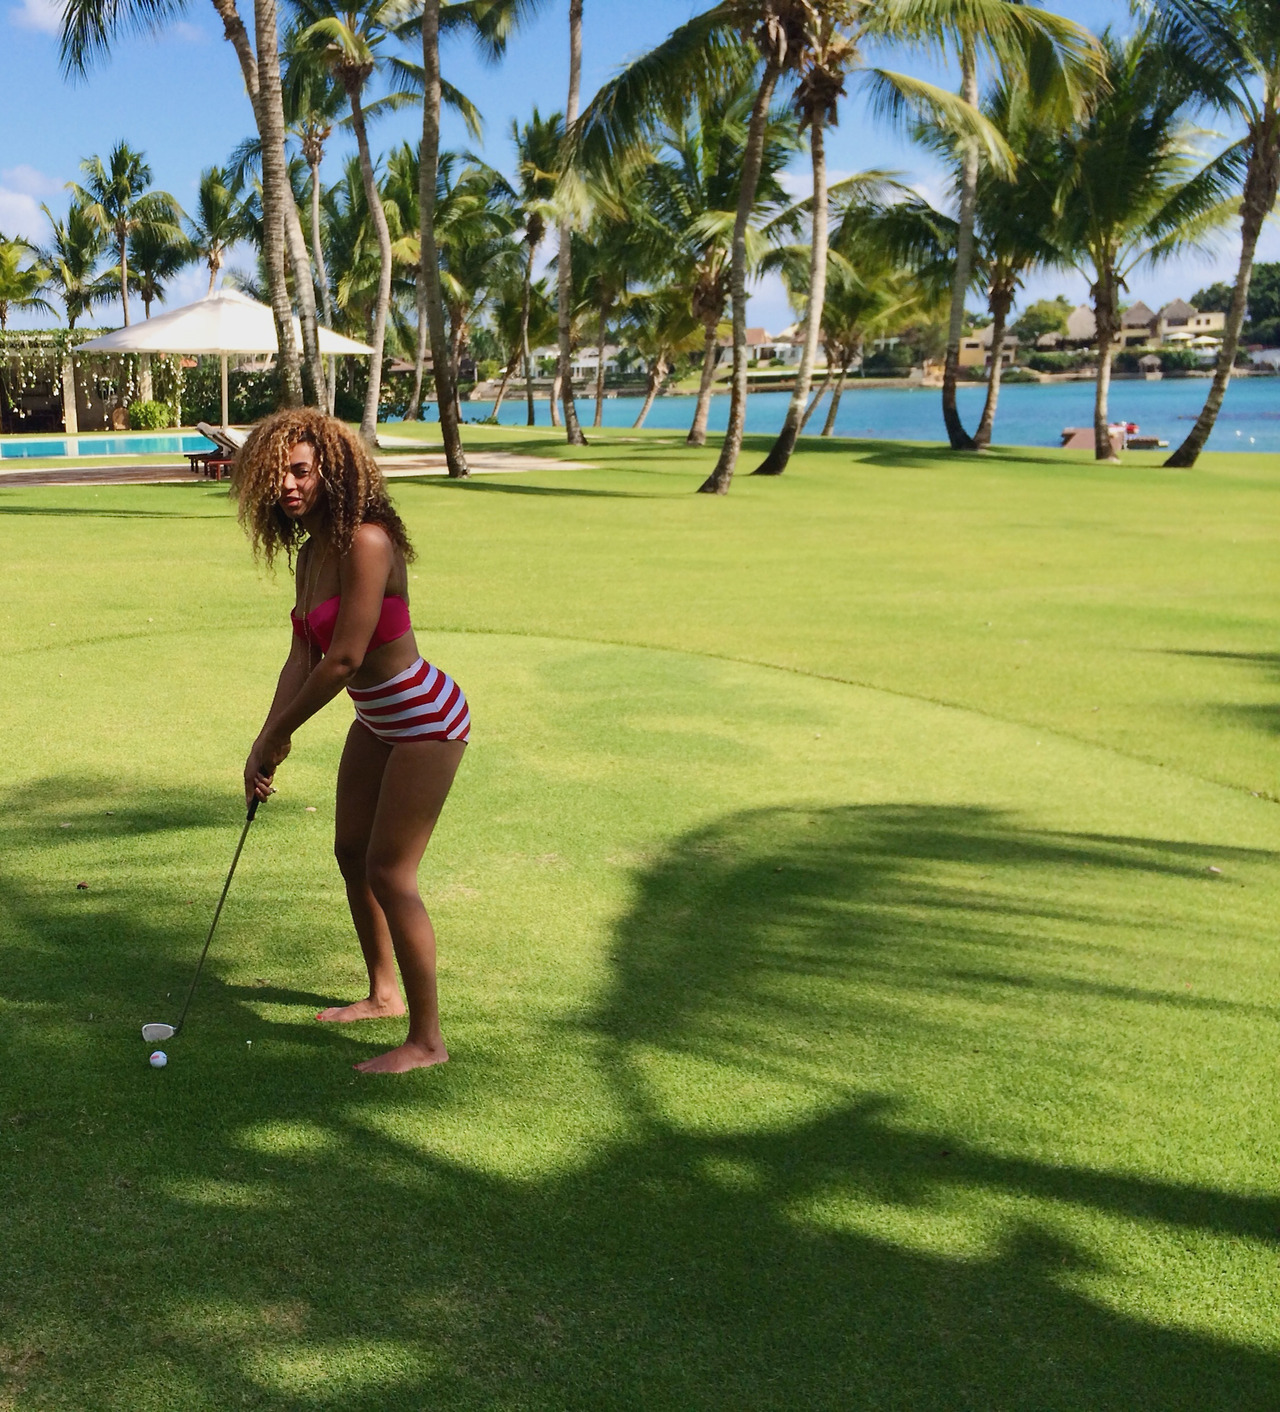 Beyoncé playing golf